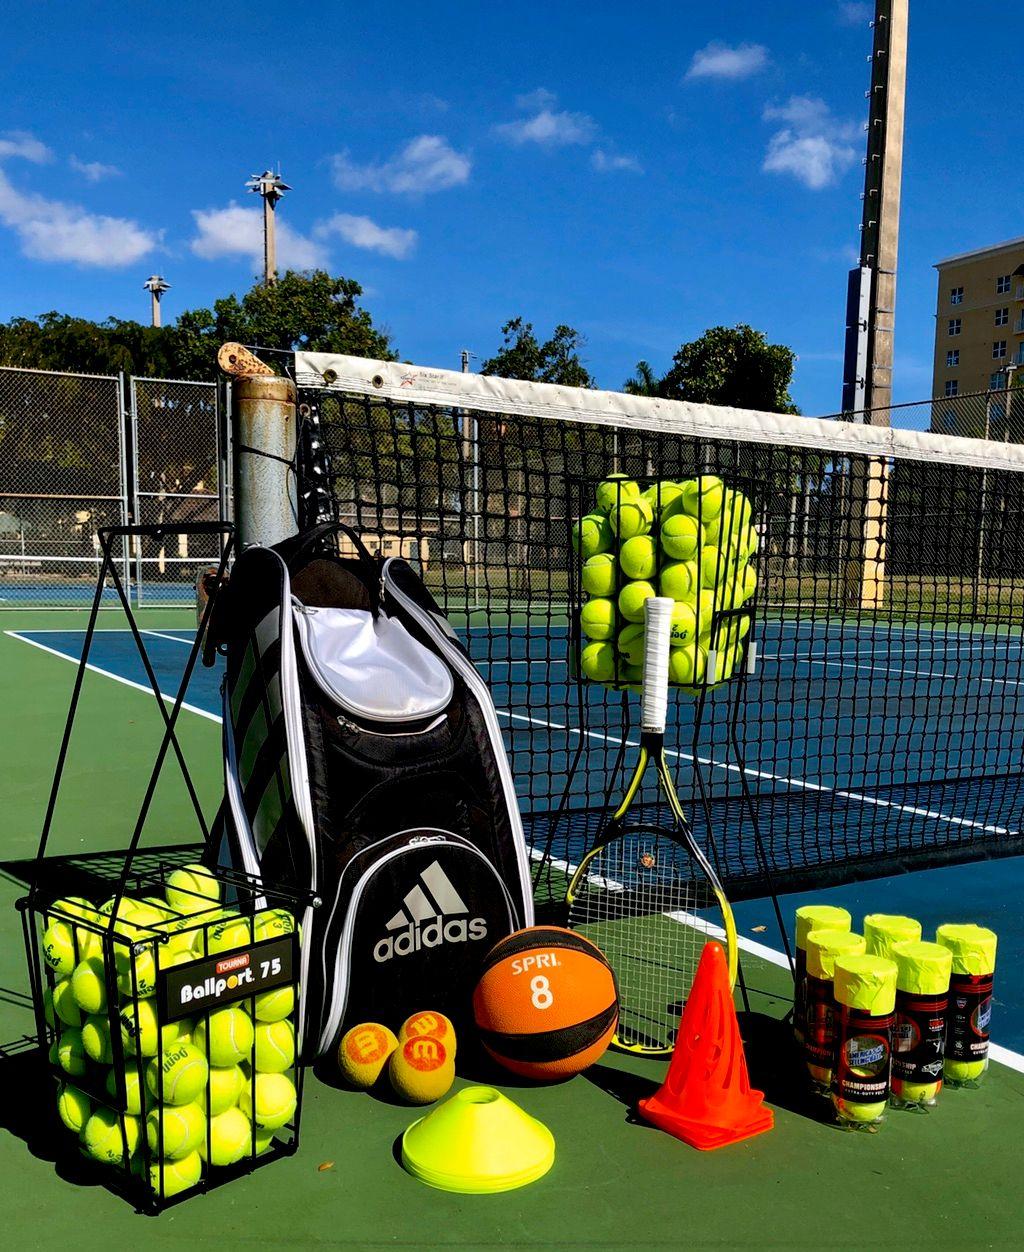 Tennis AnyJuan? 🎾